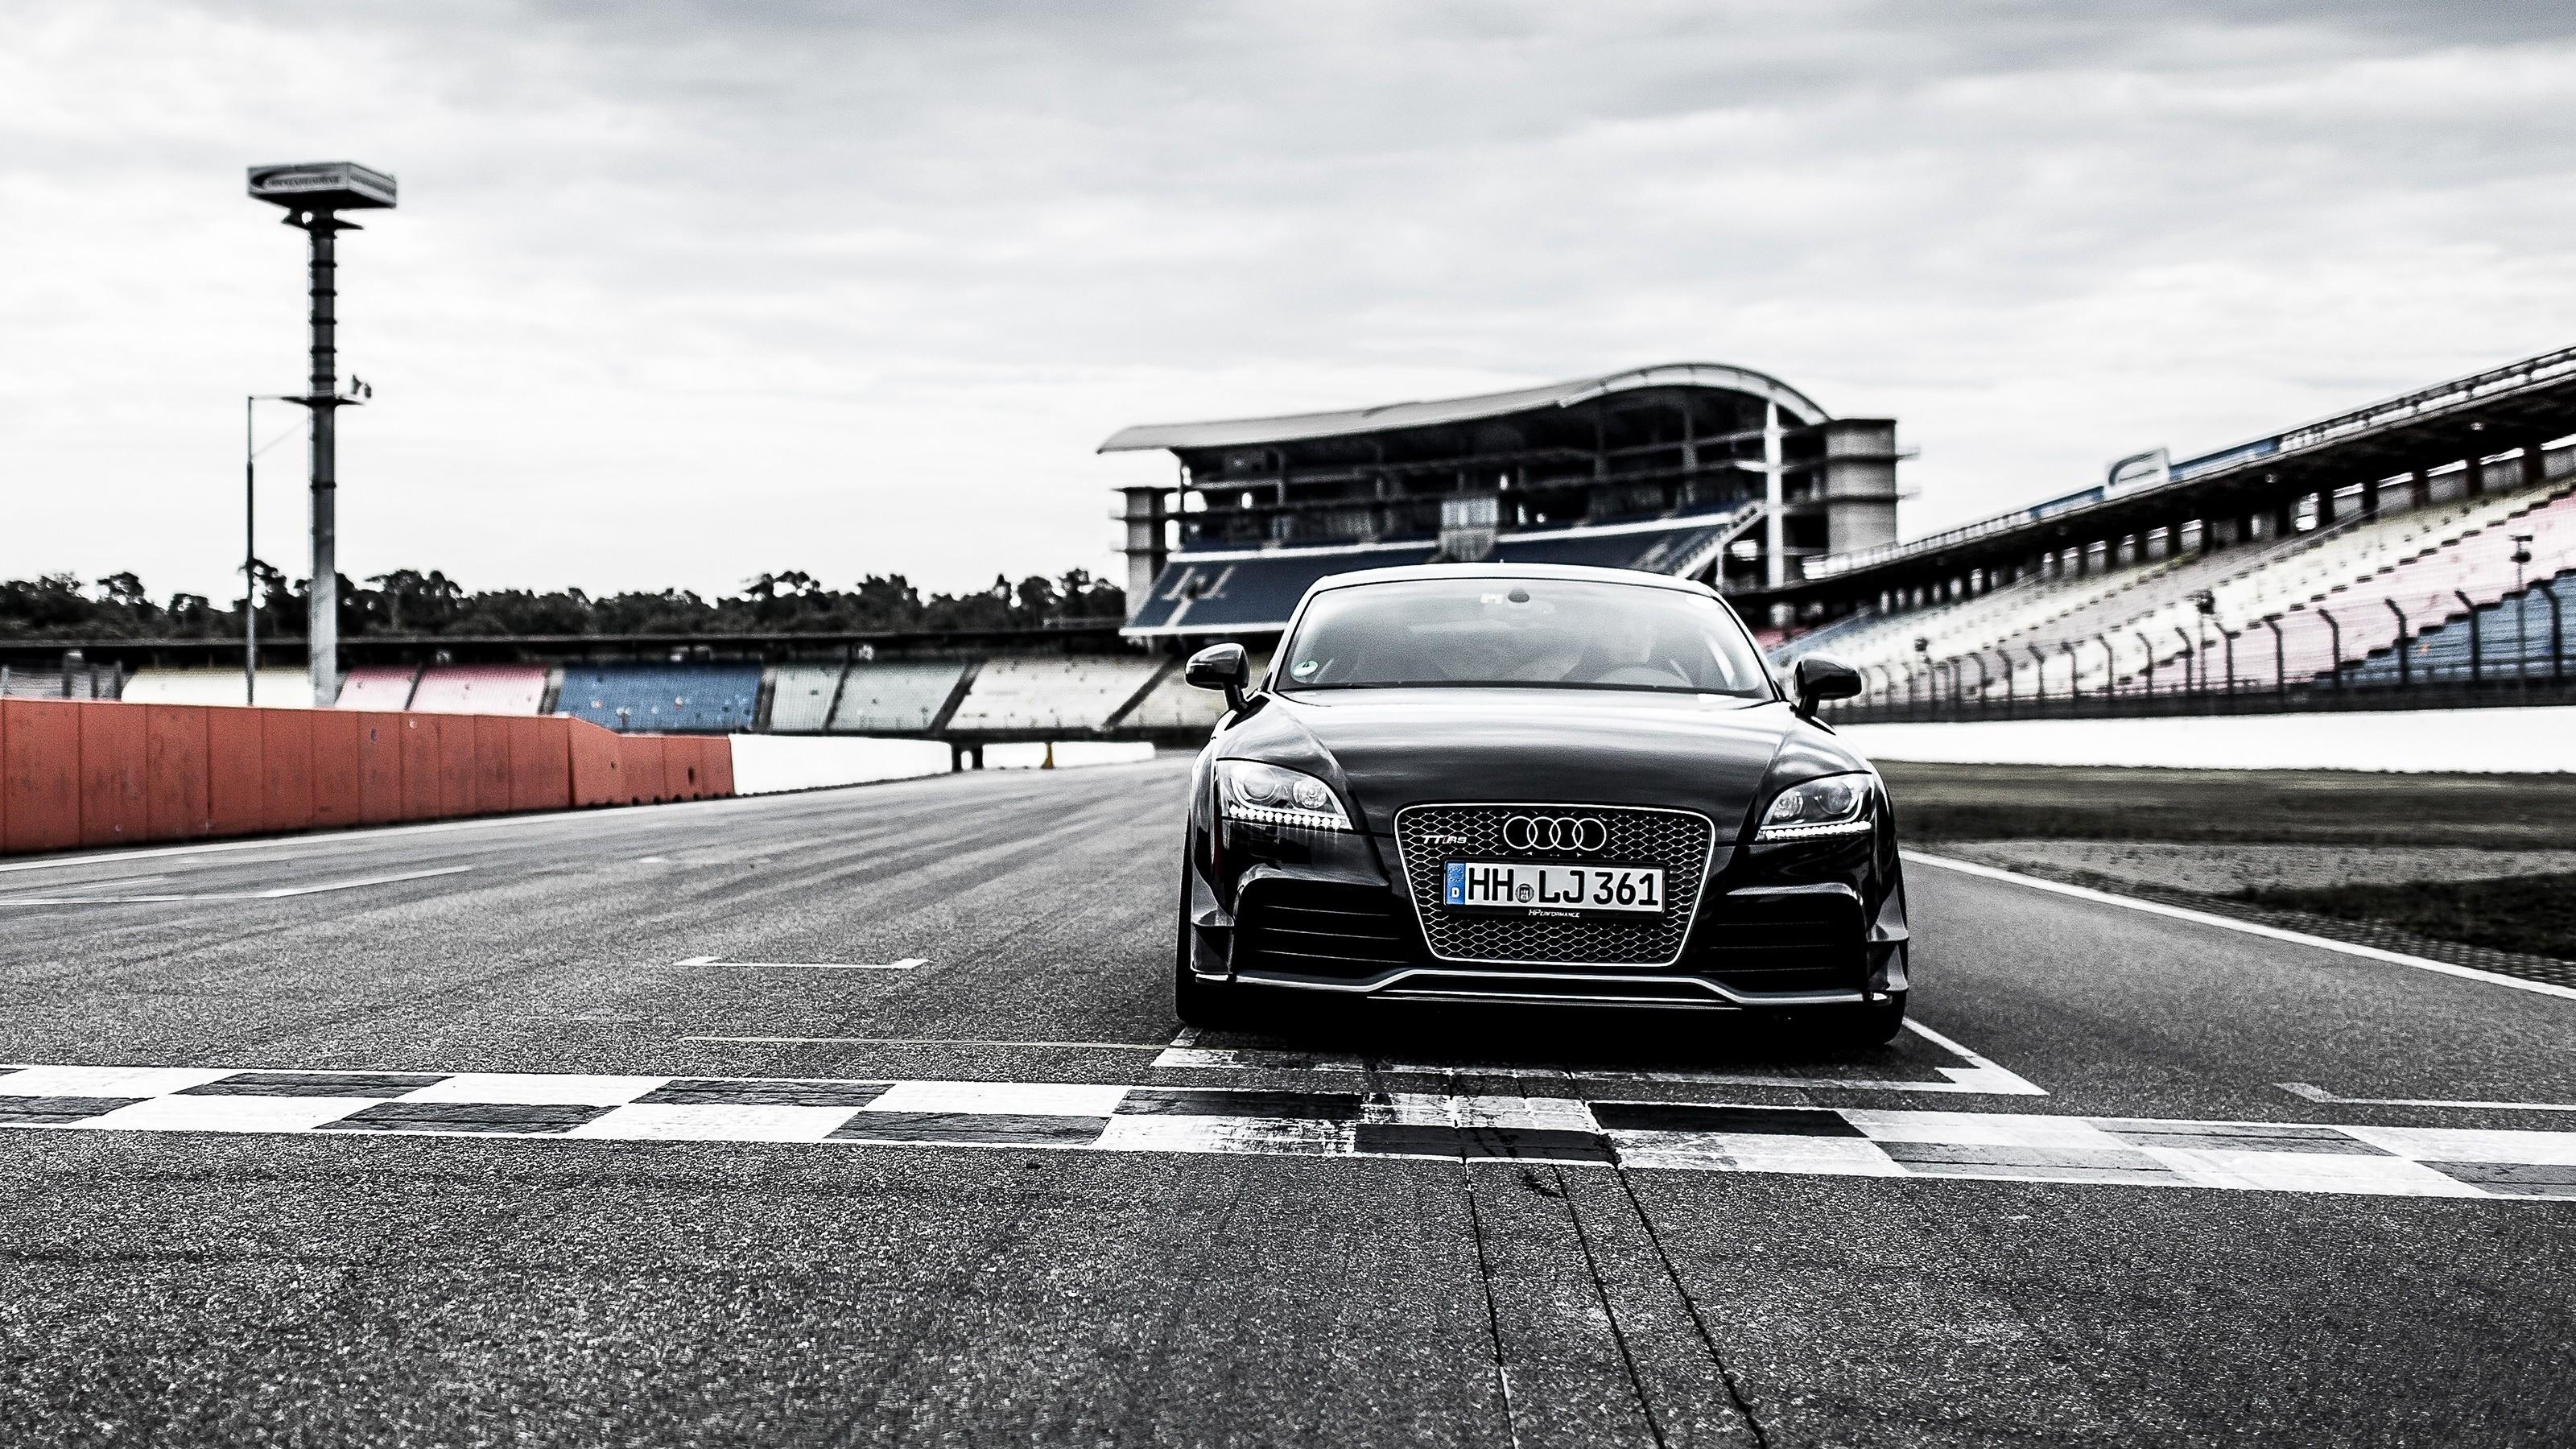 Res: 3200x1800, Vehicles - Audi TT Audi Black Car Sport Car Car Vehicle Wallpaper